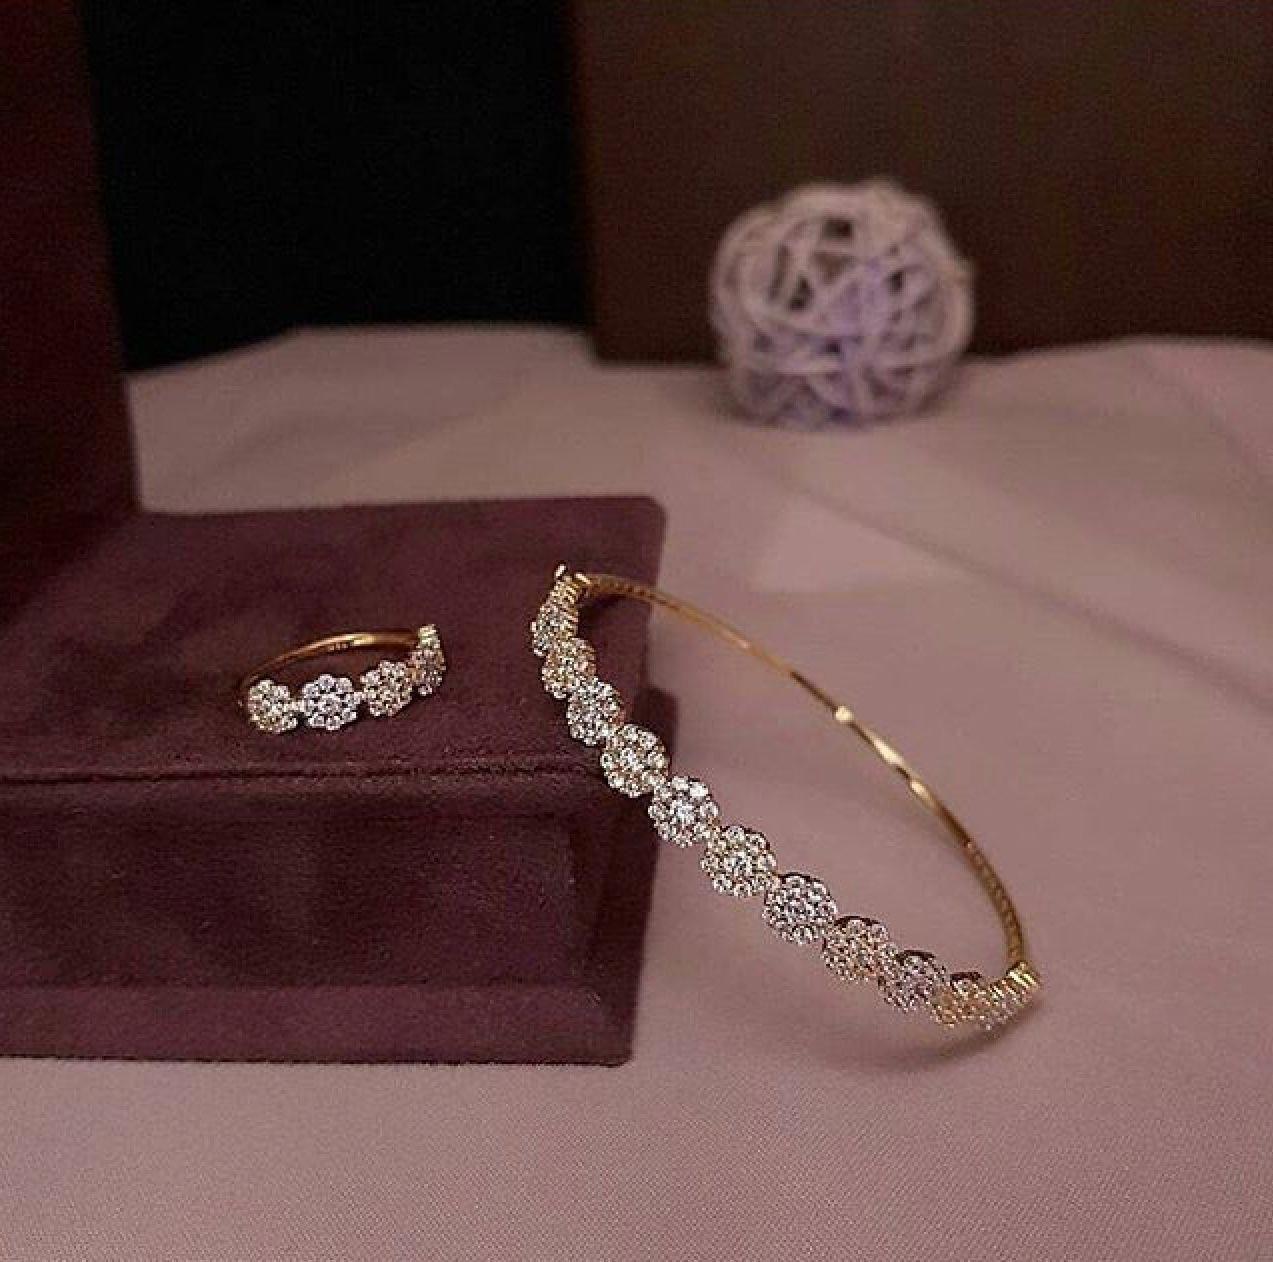 Diamond Tennis Bracelets 8301 Diamondtennisbracelets Jewelry Bracelets Gold Gold Jewelry Fashion Bangles Jewelry Designs